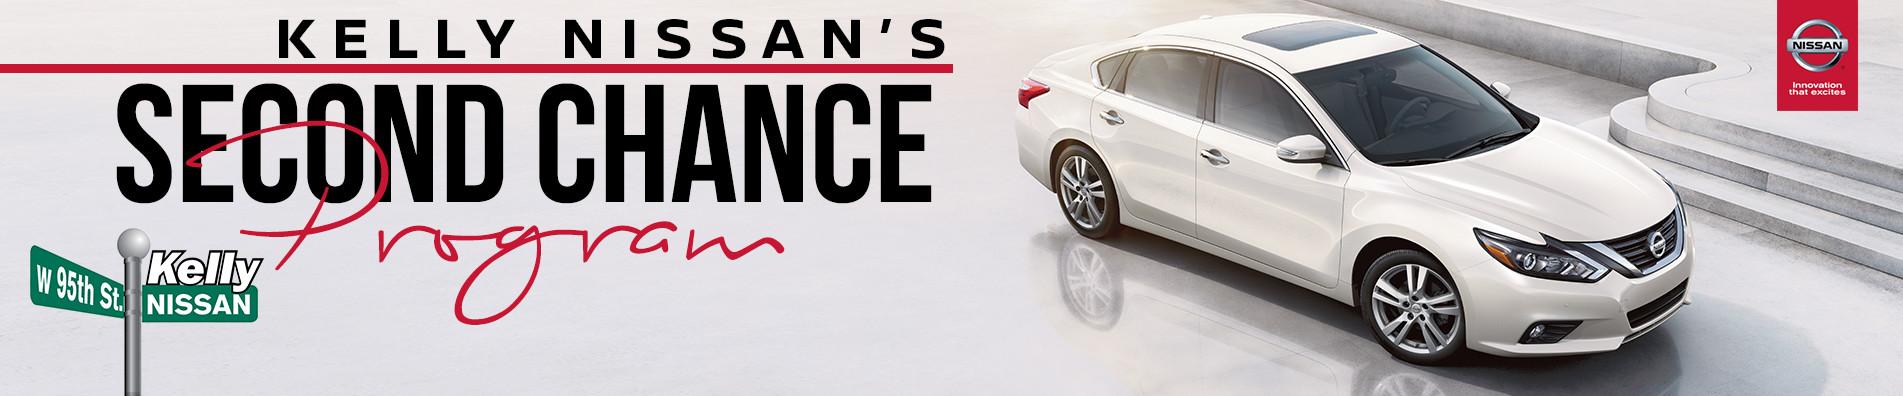 Kelly Nissanu0027s New Second Chance Auto Loan Program!